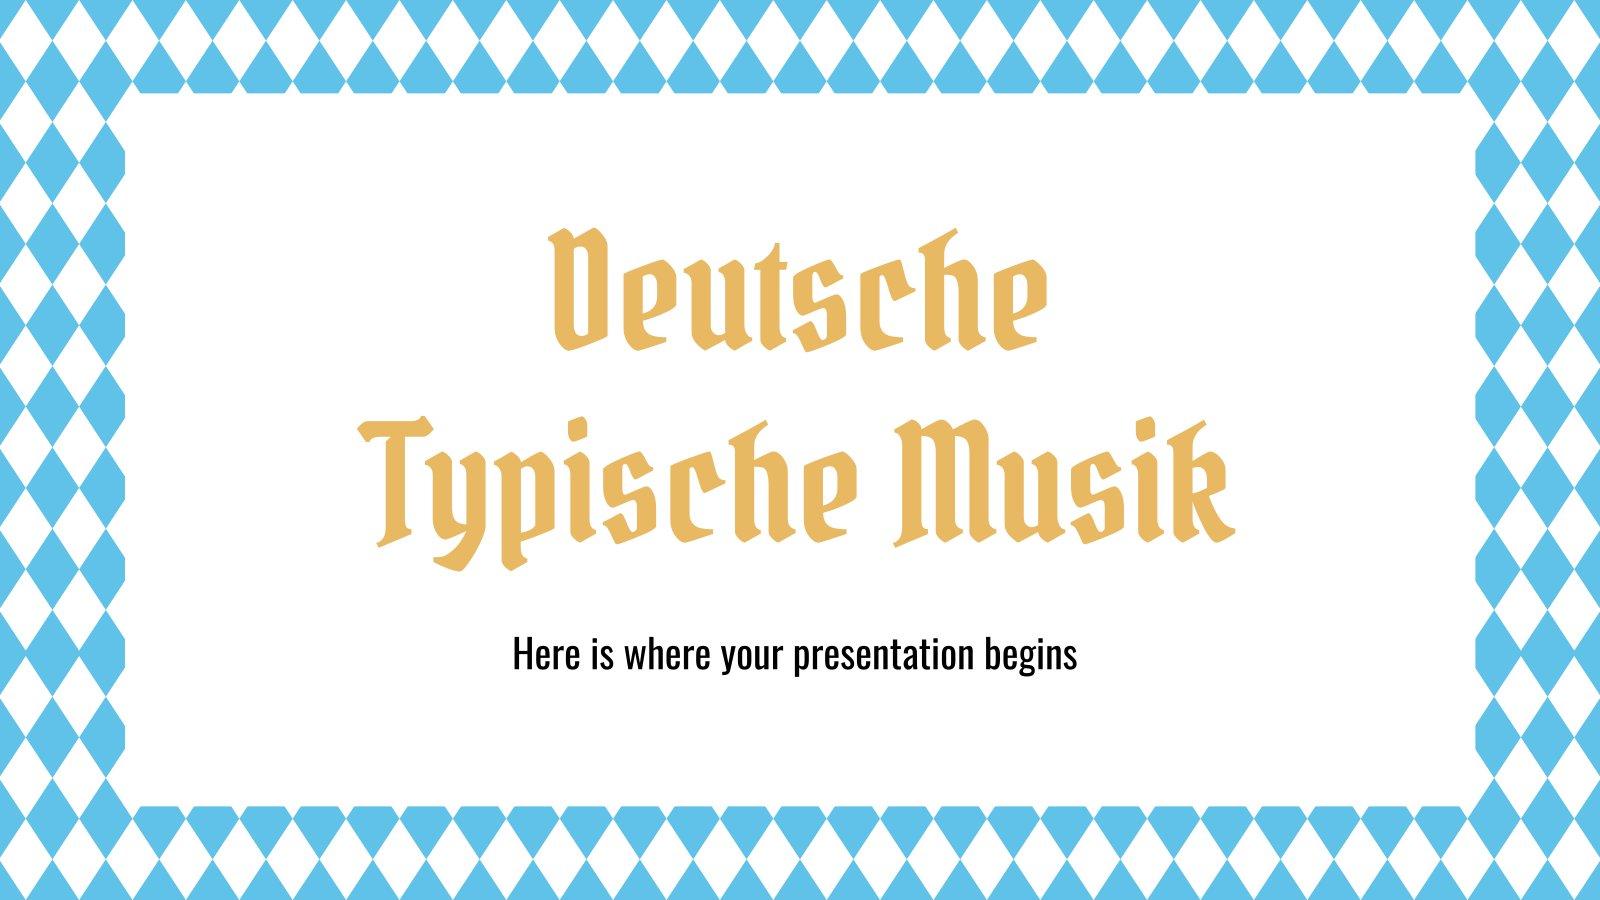 Plantilla de presentación Deutsche Typische Musik